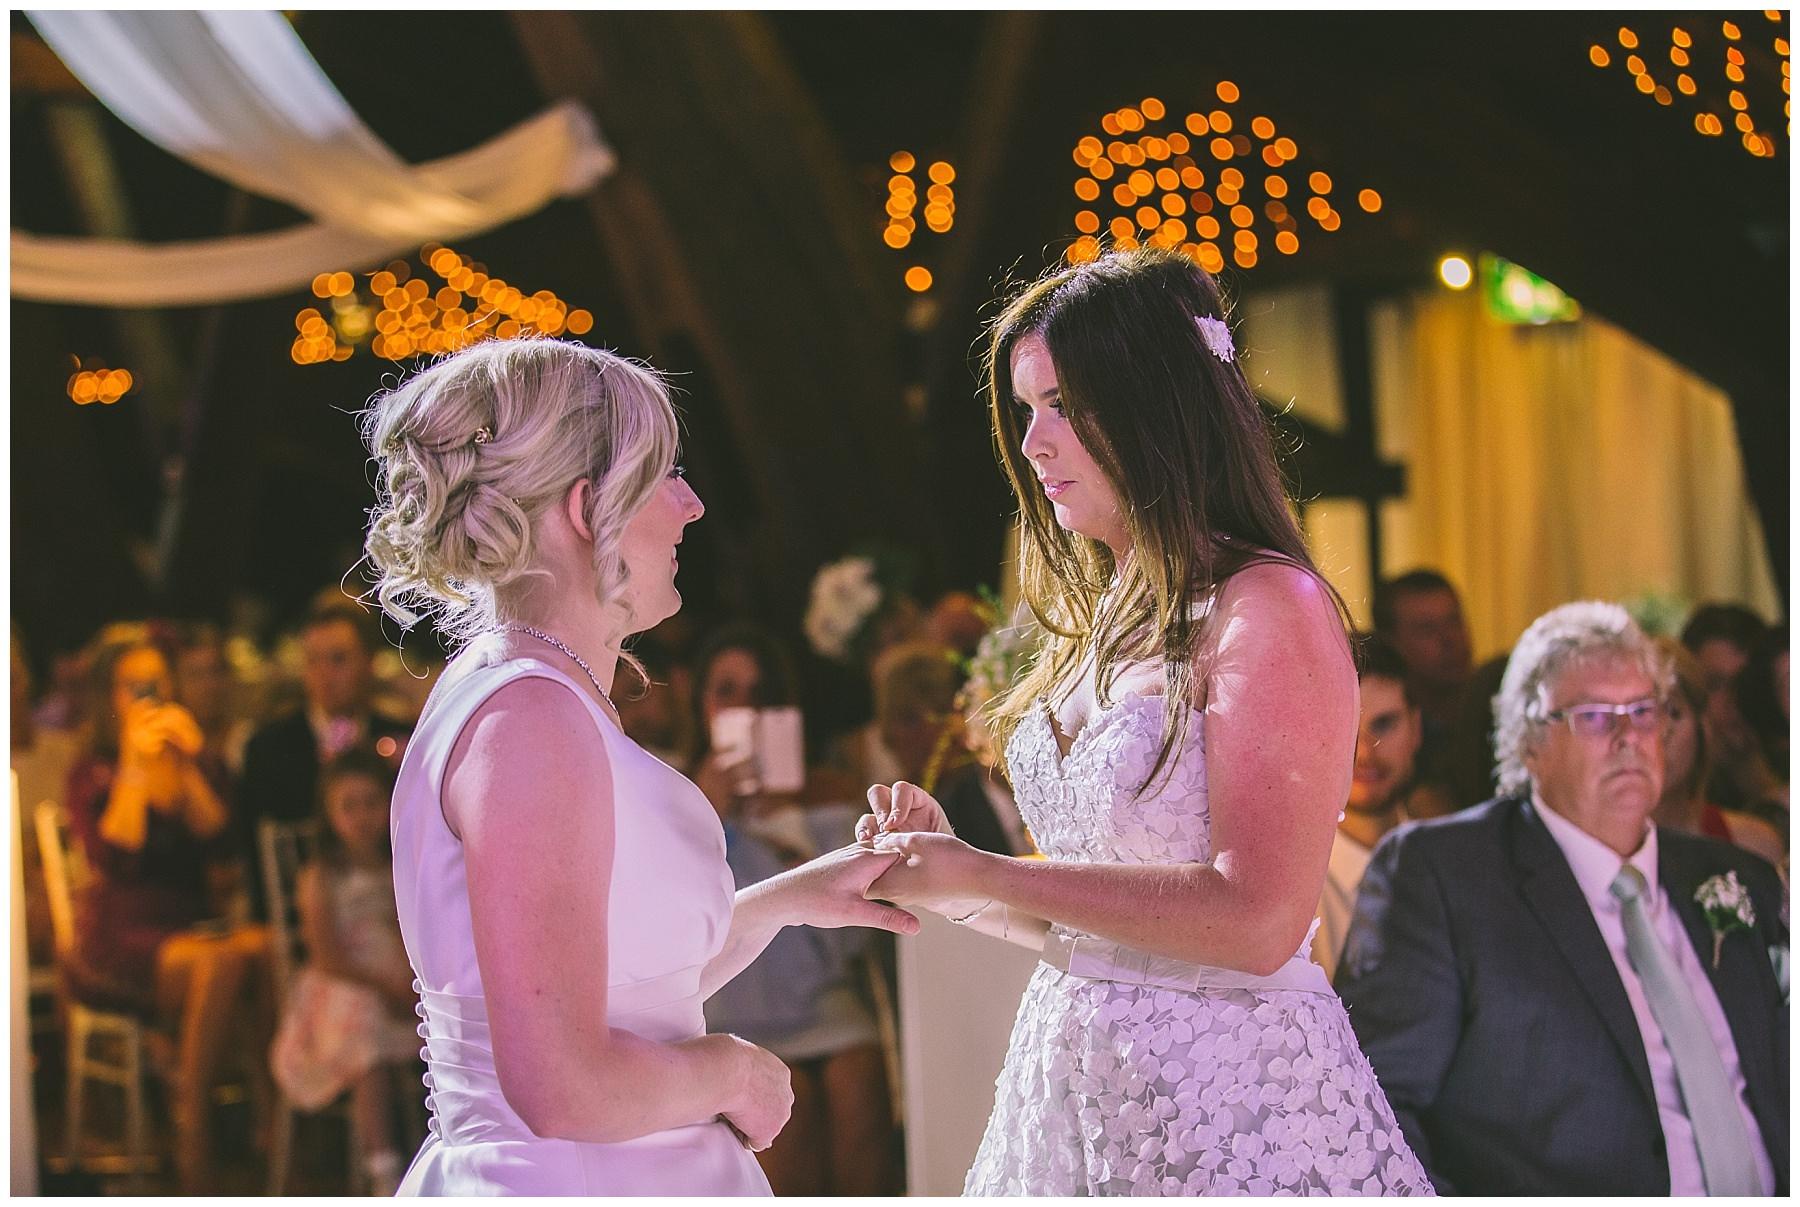 Wedding ring exchange during same sex wedding ceremony